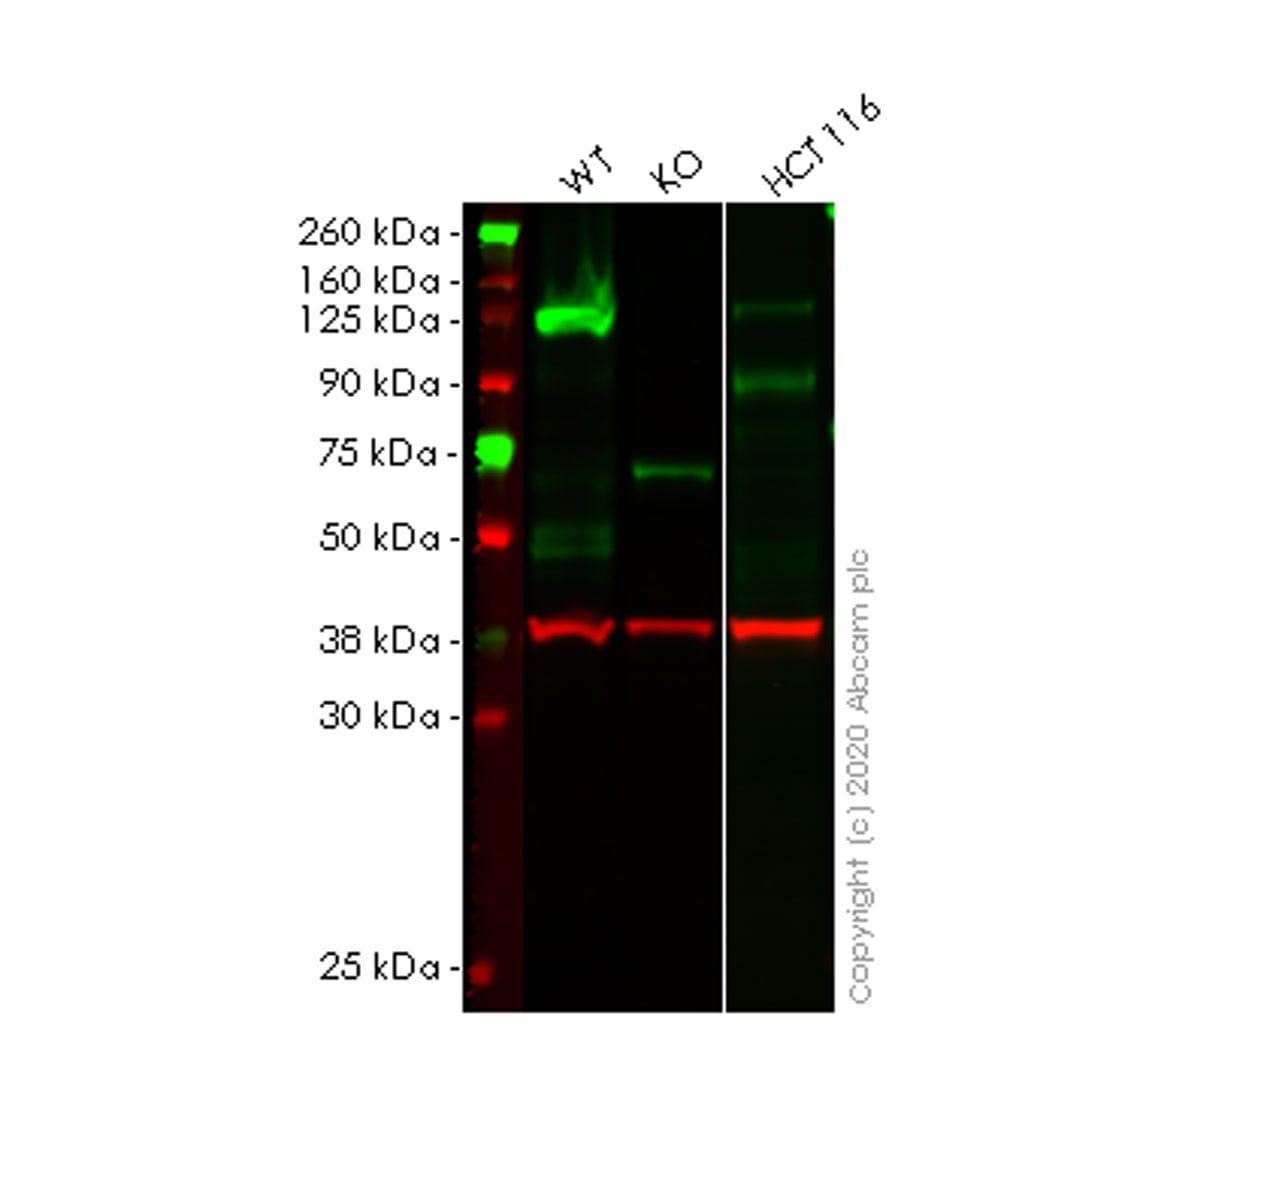 Western blot - Anti-TACC3 antibody [EPR7756] - BSA and Azide free (ab224525)